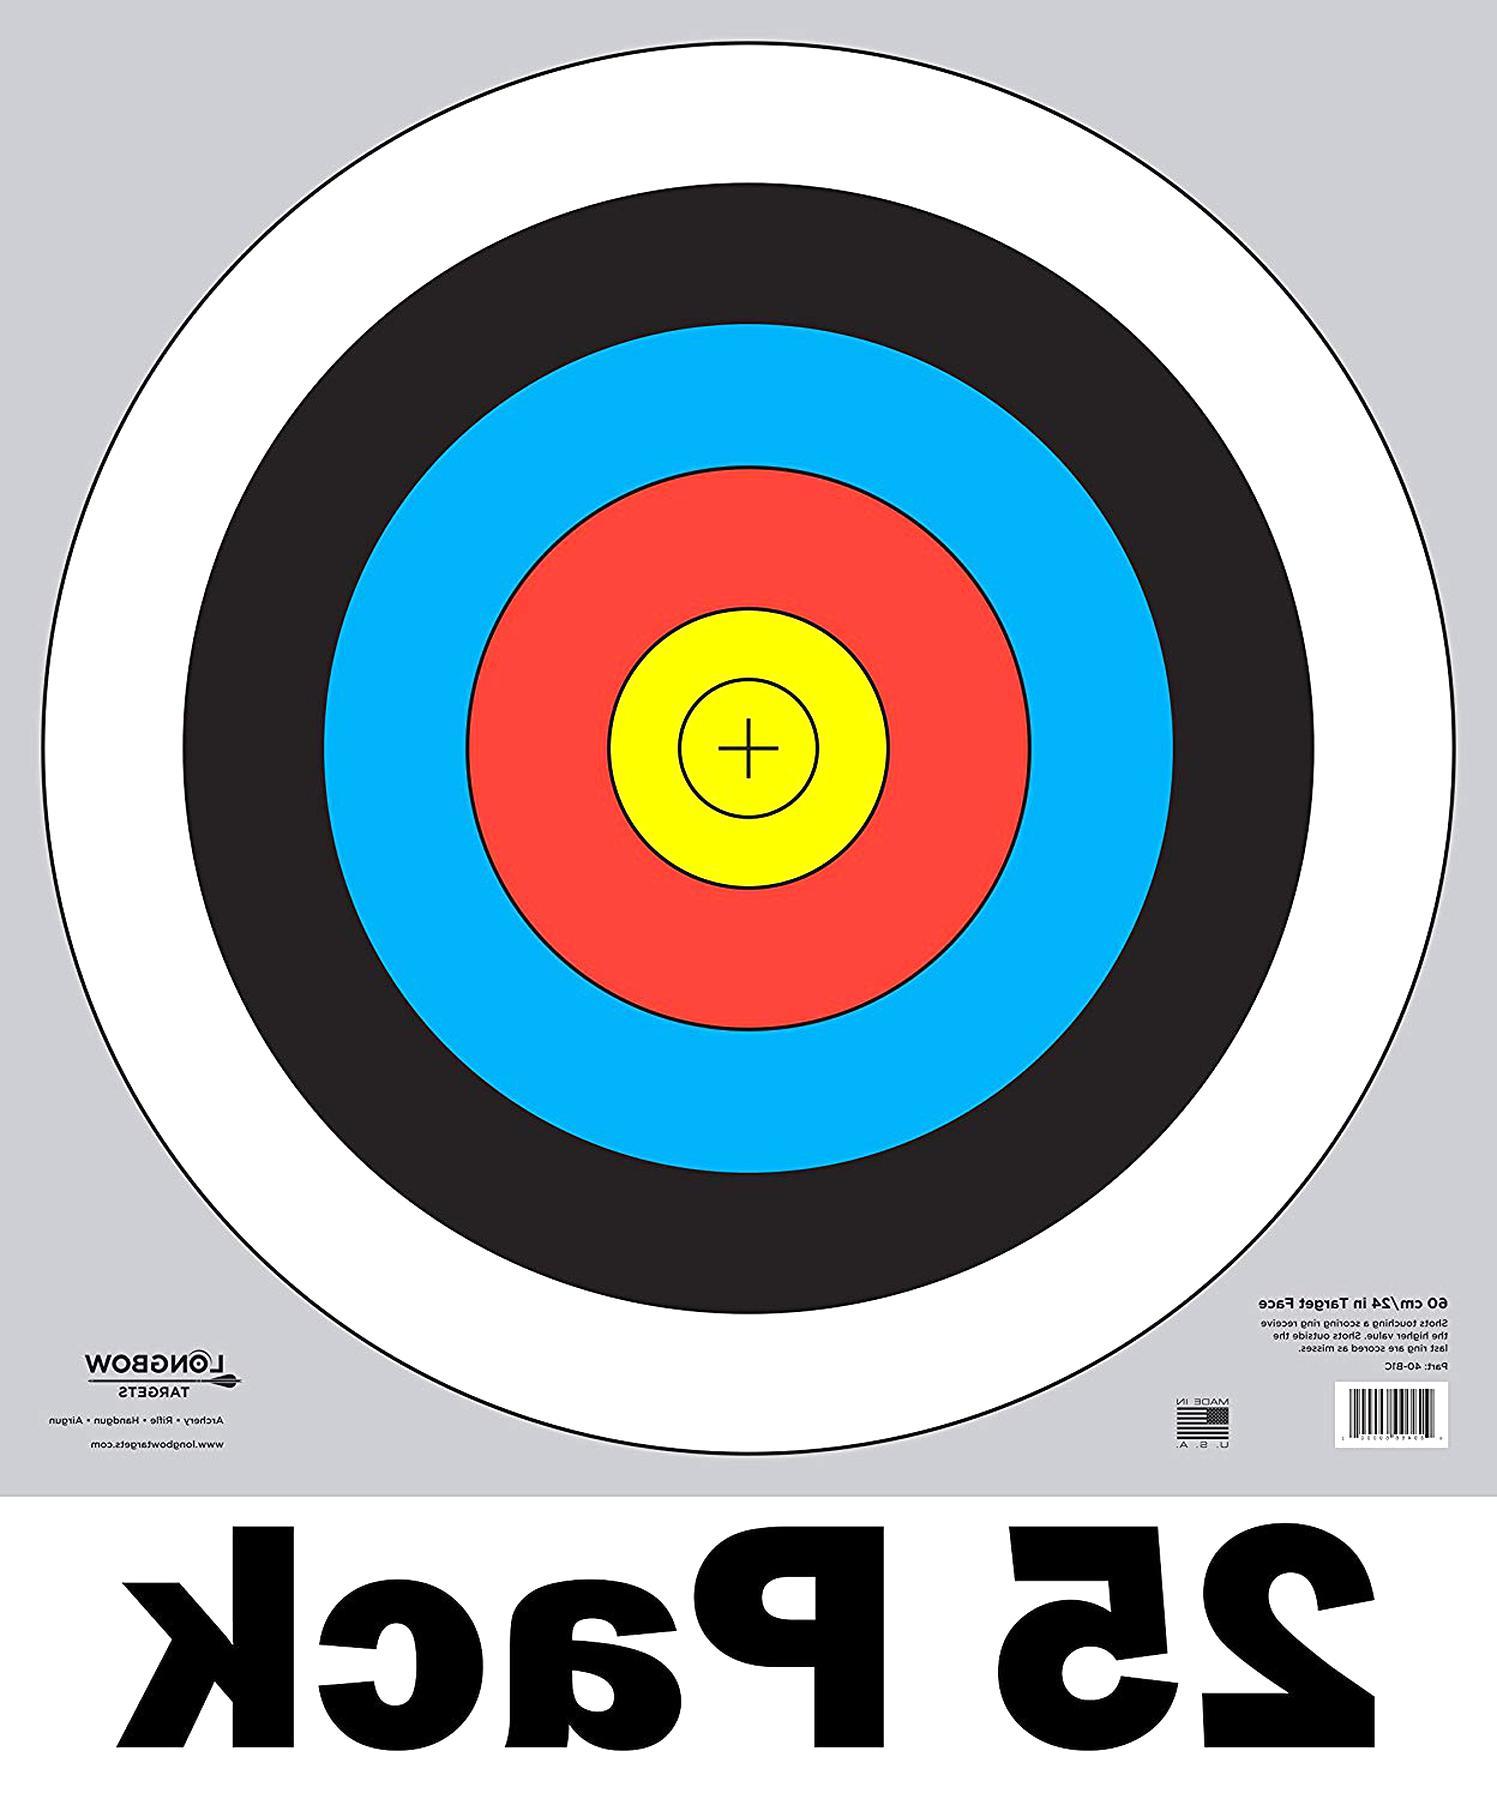 gun targets for sale